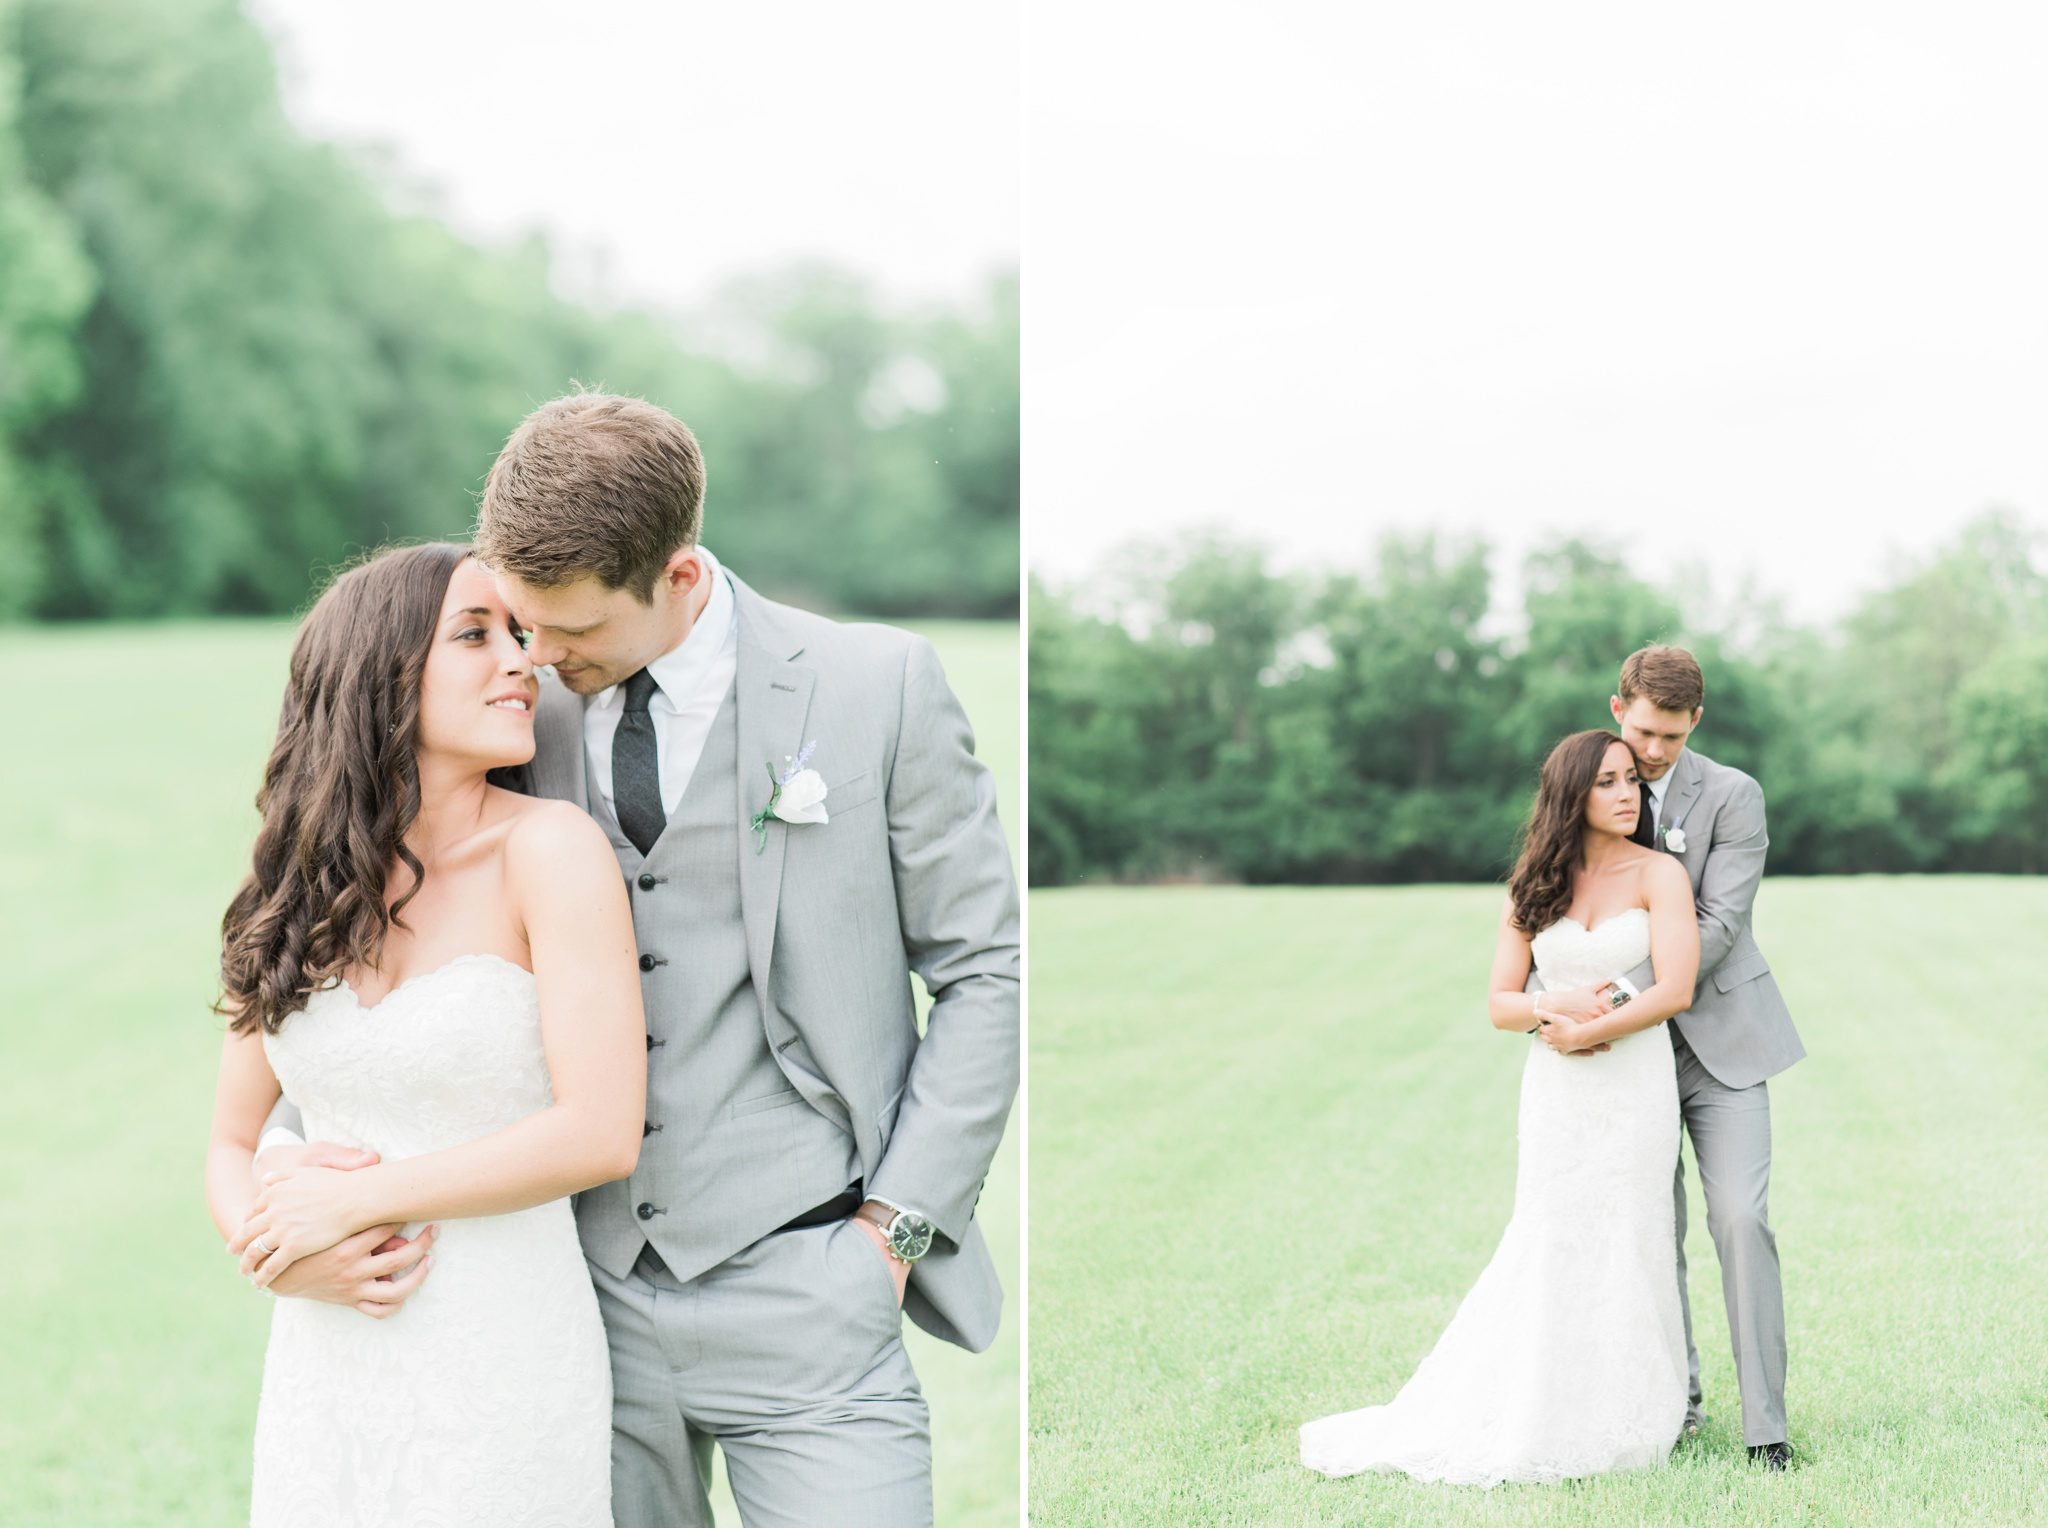 niederman-farm-wedding-cincinnati-ohio-photographer_0089.jpg